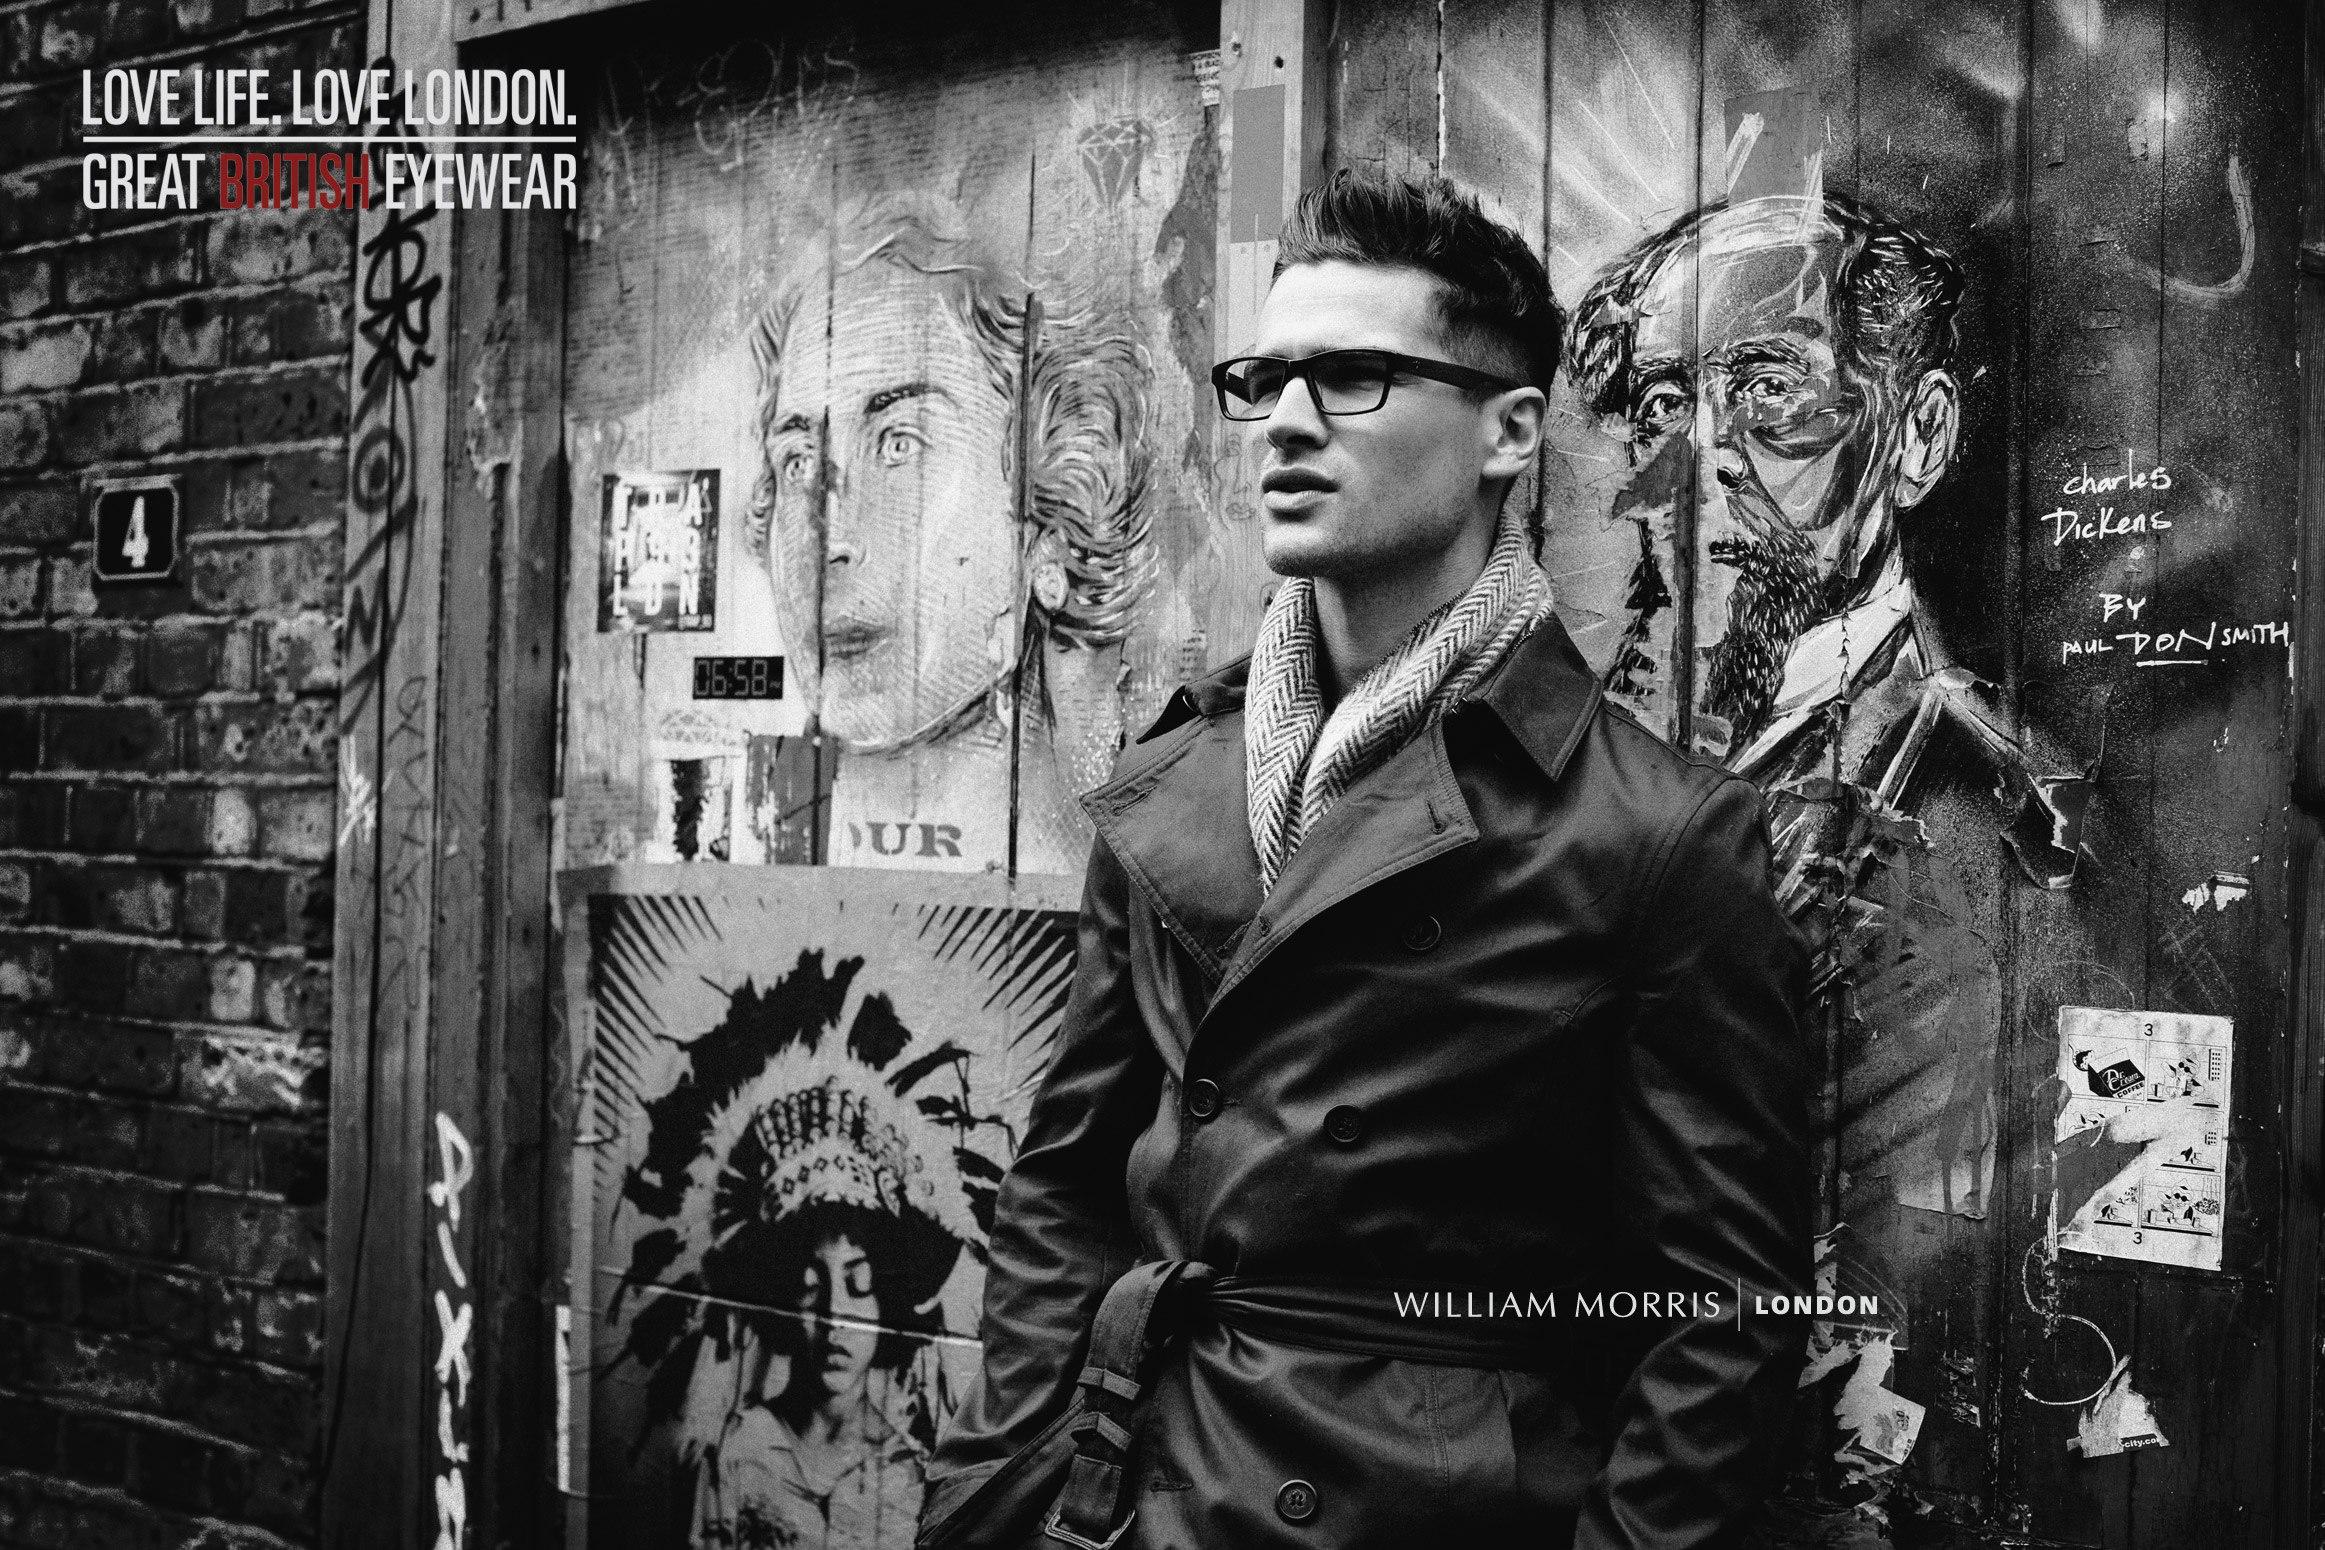 william-morris-london-2014-campaign-glasses-eyewear-a10